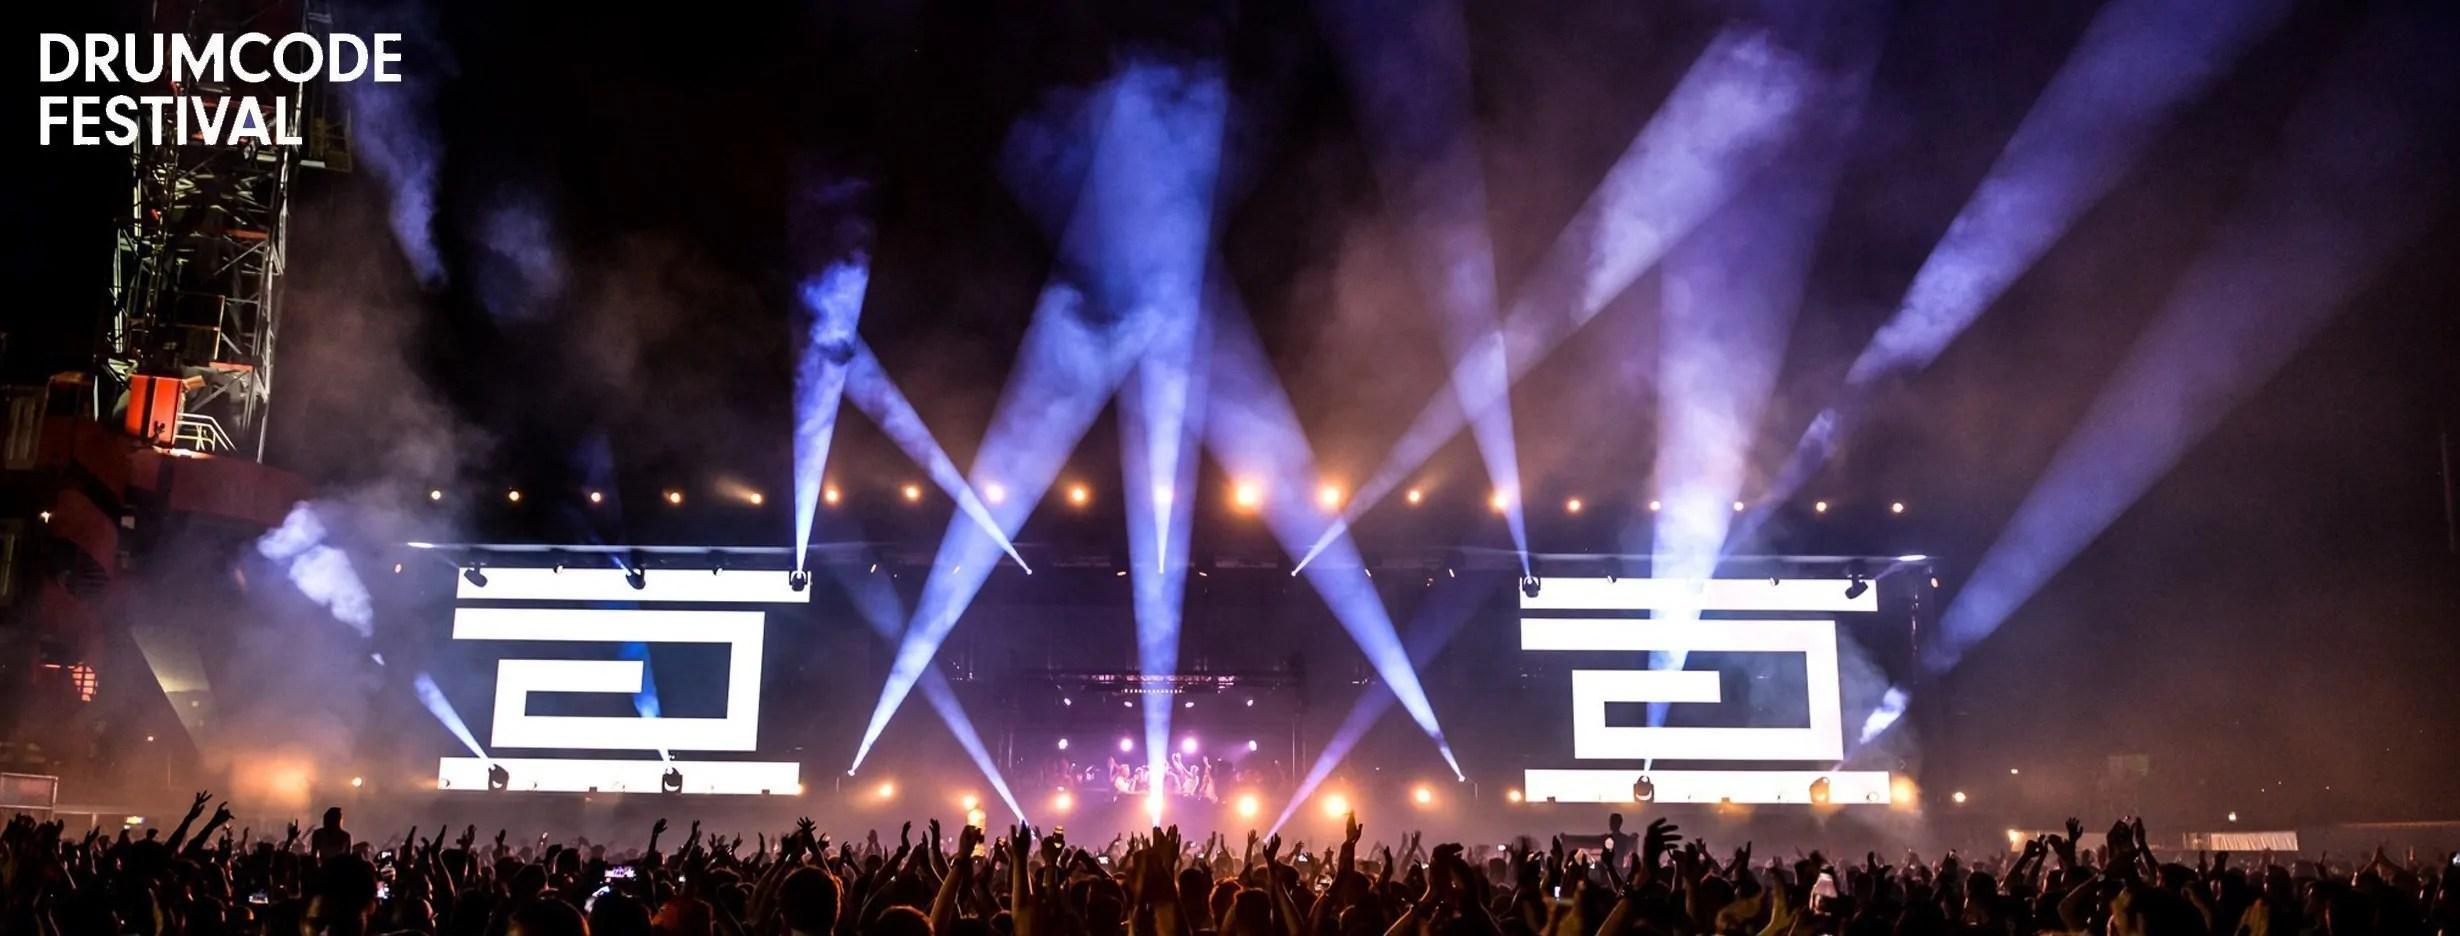 Drumcode Festival Amsterdam